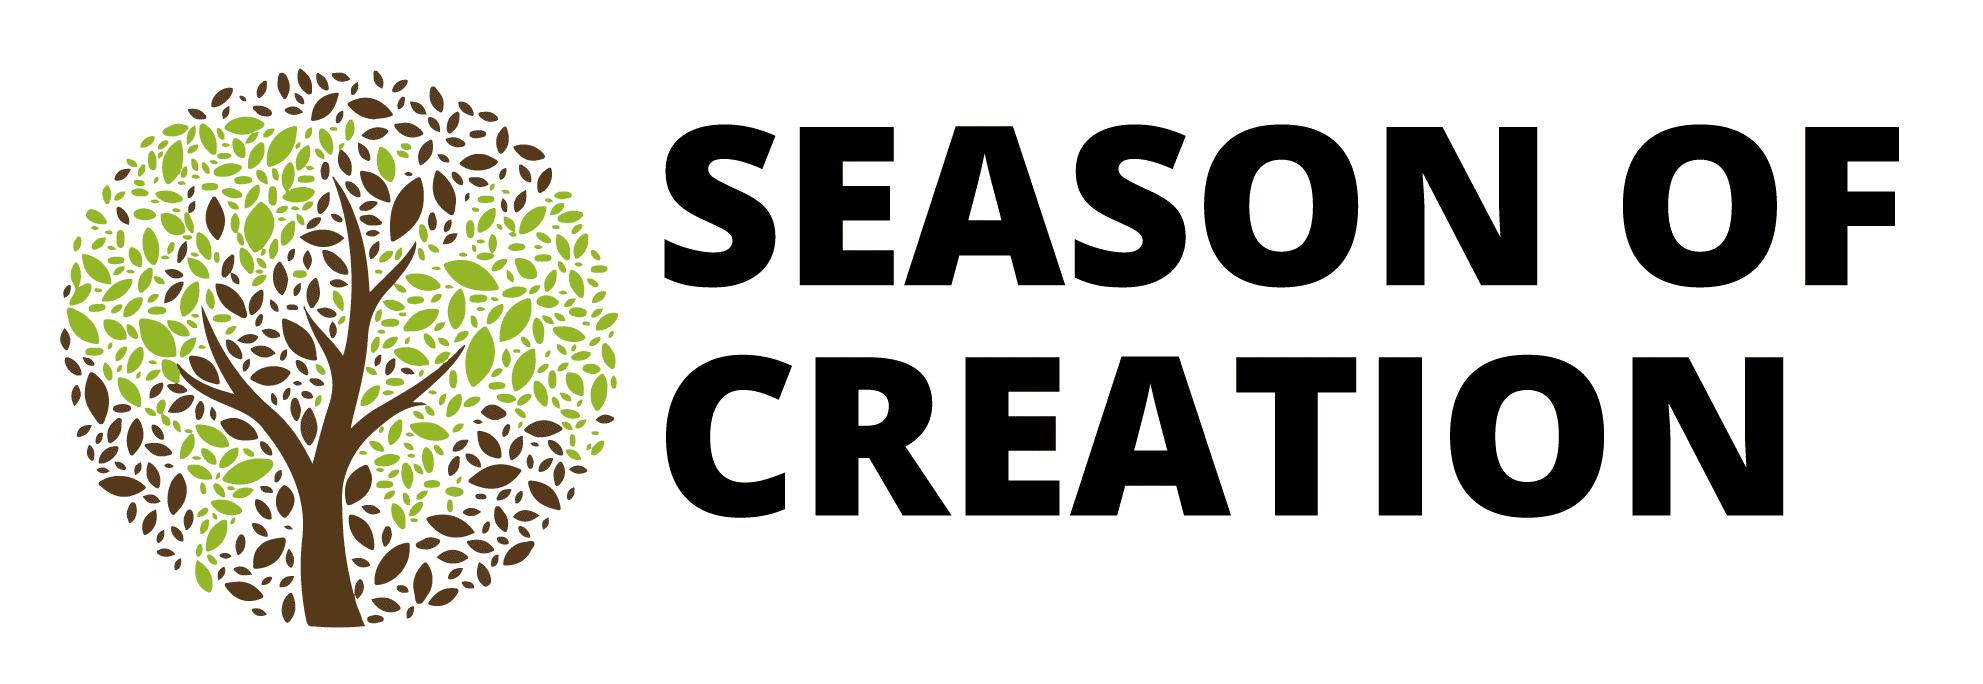 The Season of Creation